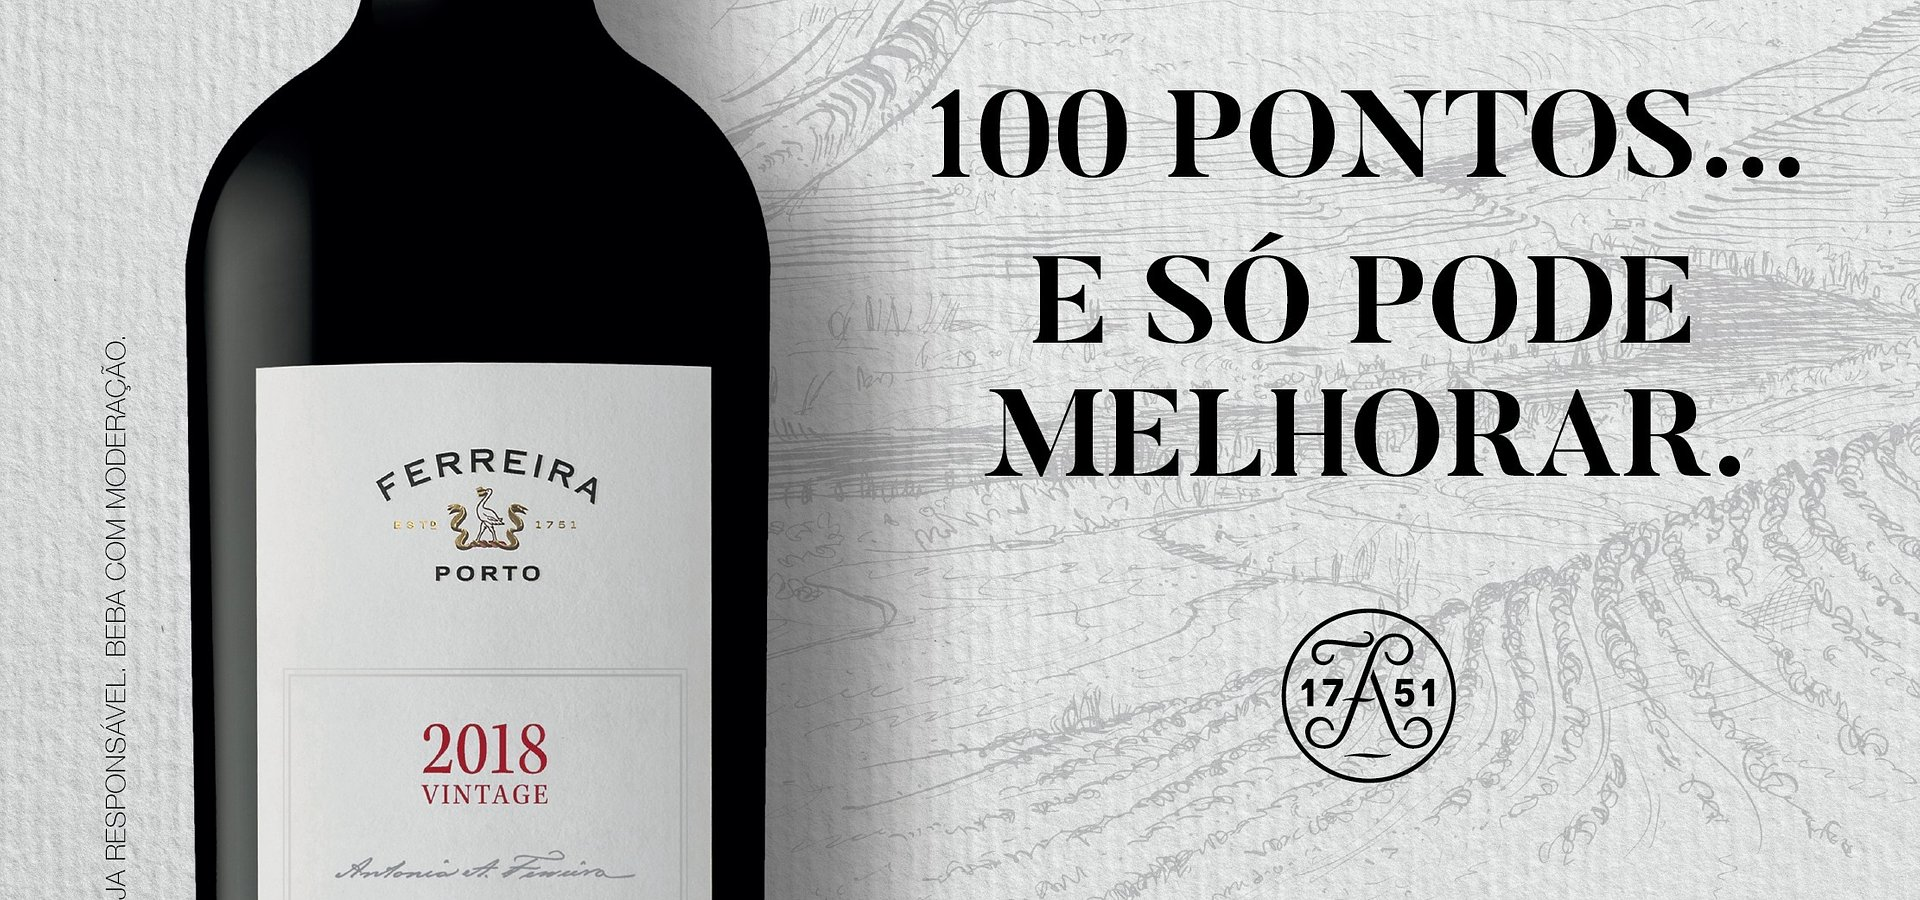 100 PONTOS DA WINE ENTHUSIAST PARA PORTO FERREIRA VINTAGE 2018